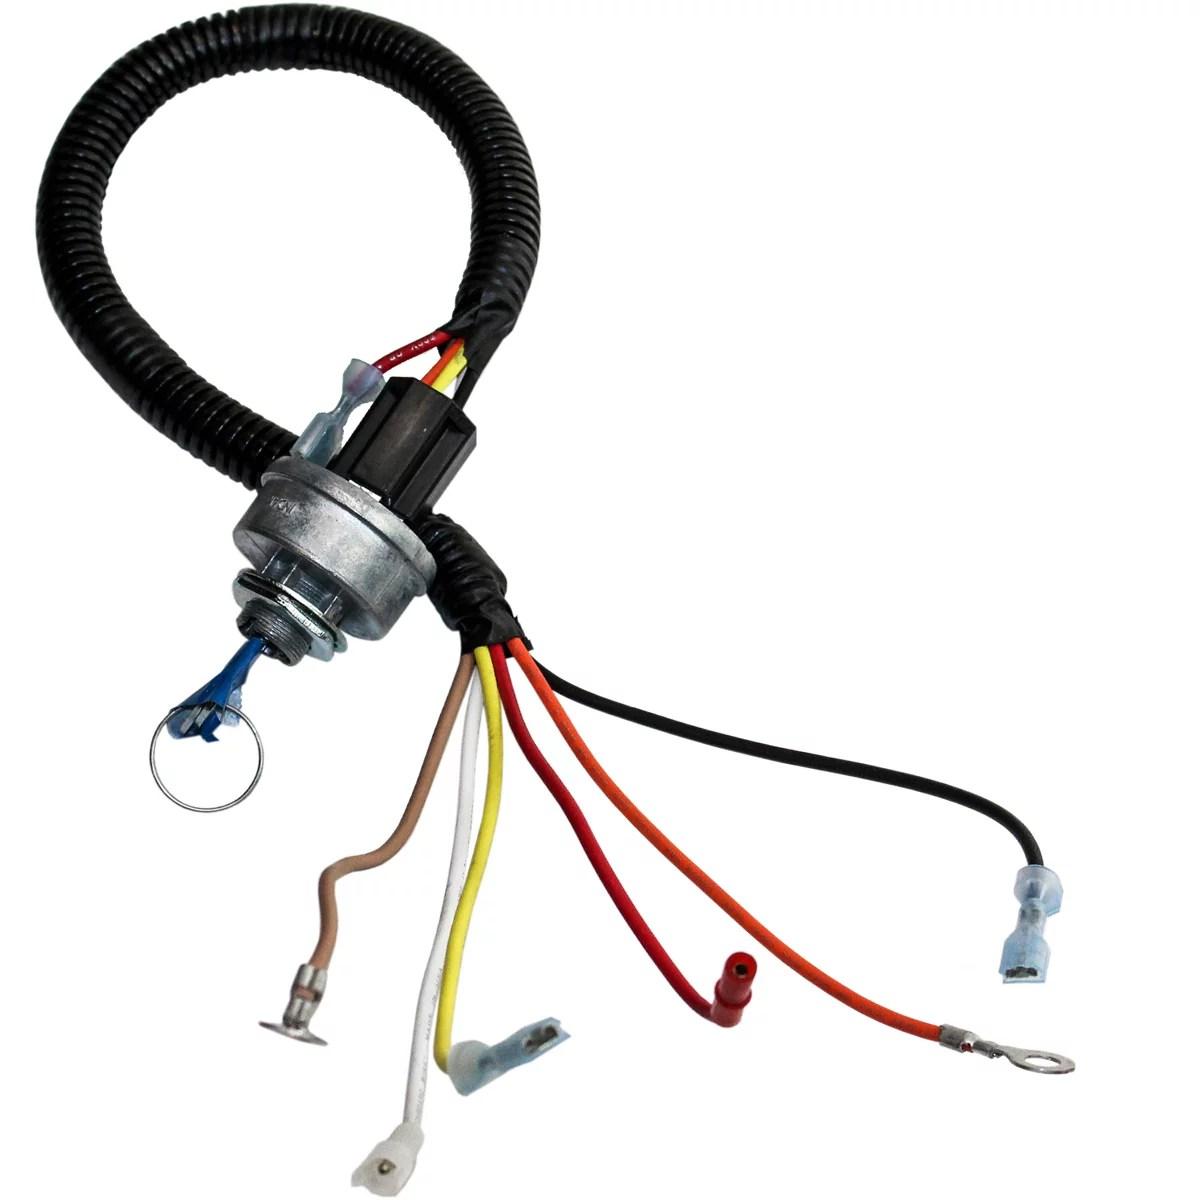 medium resolution of briggs vanguard engine switch kit with wiring cushman 692318 bs vanguard wiring harness source vanguard wiring diagram wiring diagram page 23 hp